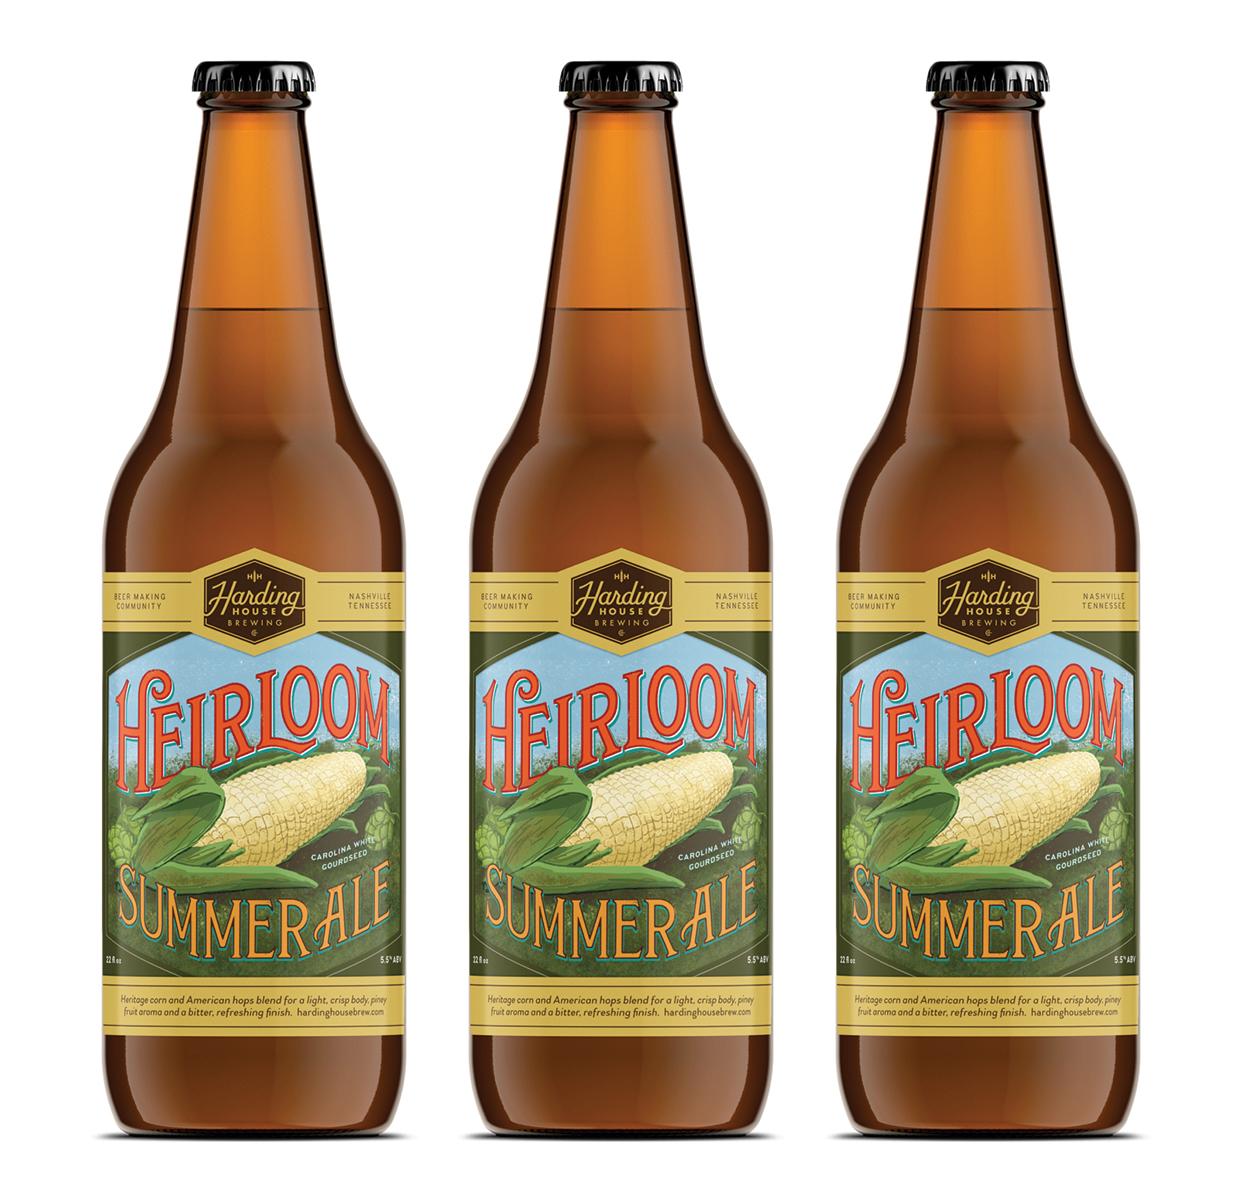 Heirloom summer ale bottles